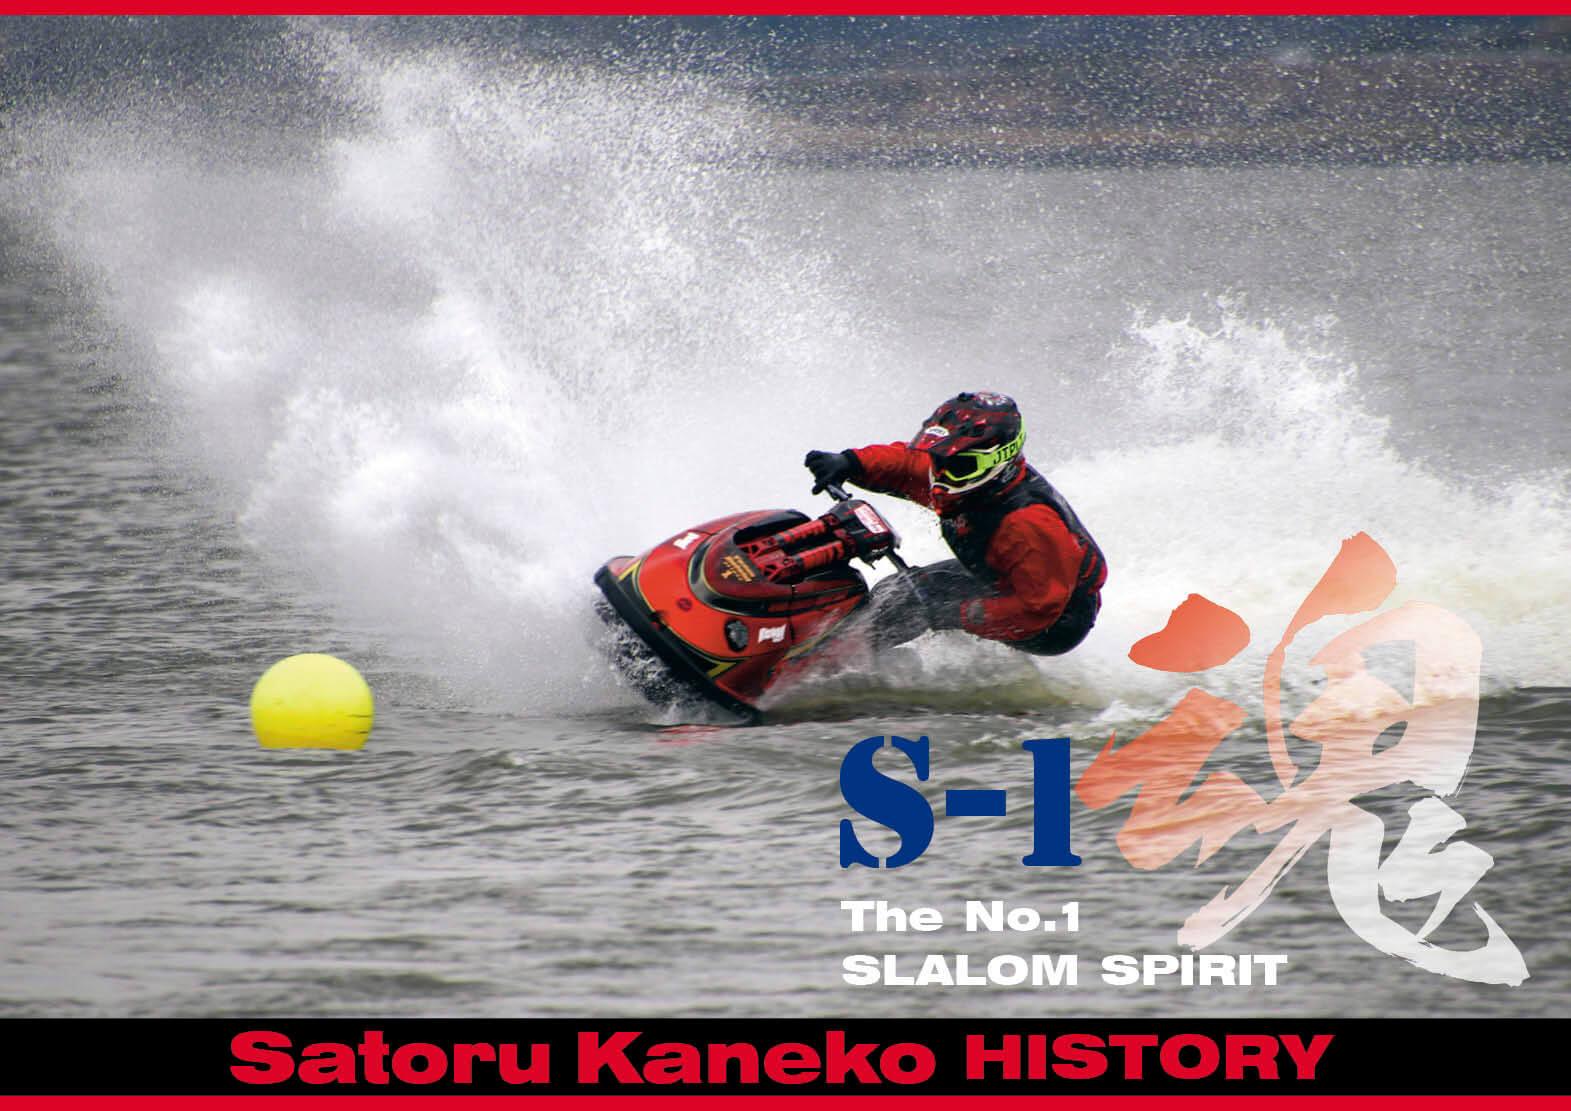 S-1スラローム・スキークラス最強チャンピオン 365日考え続けた「どうやったら速くブイを回れるのか」 金子 聡選手インタビュー【動画】 ジェットスキー(水上バイク)